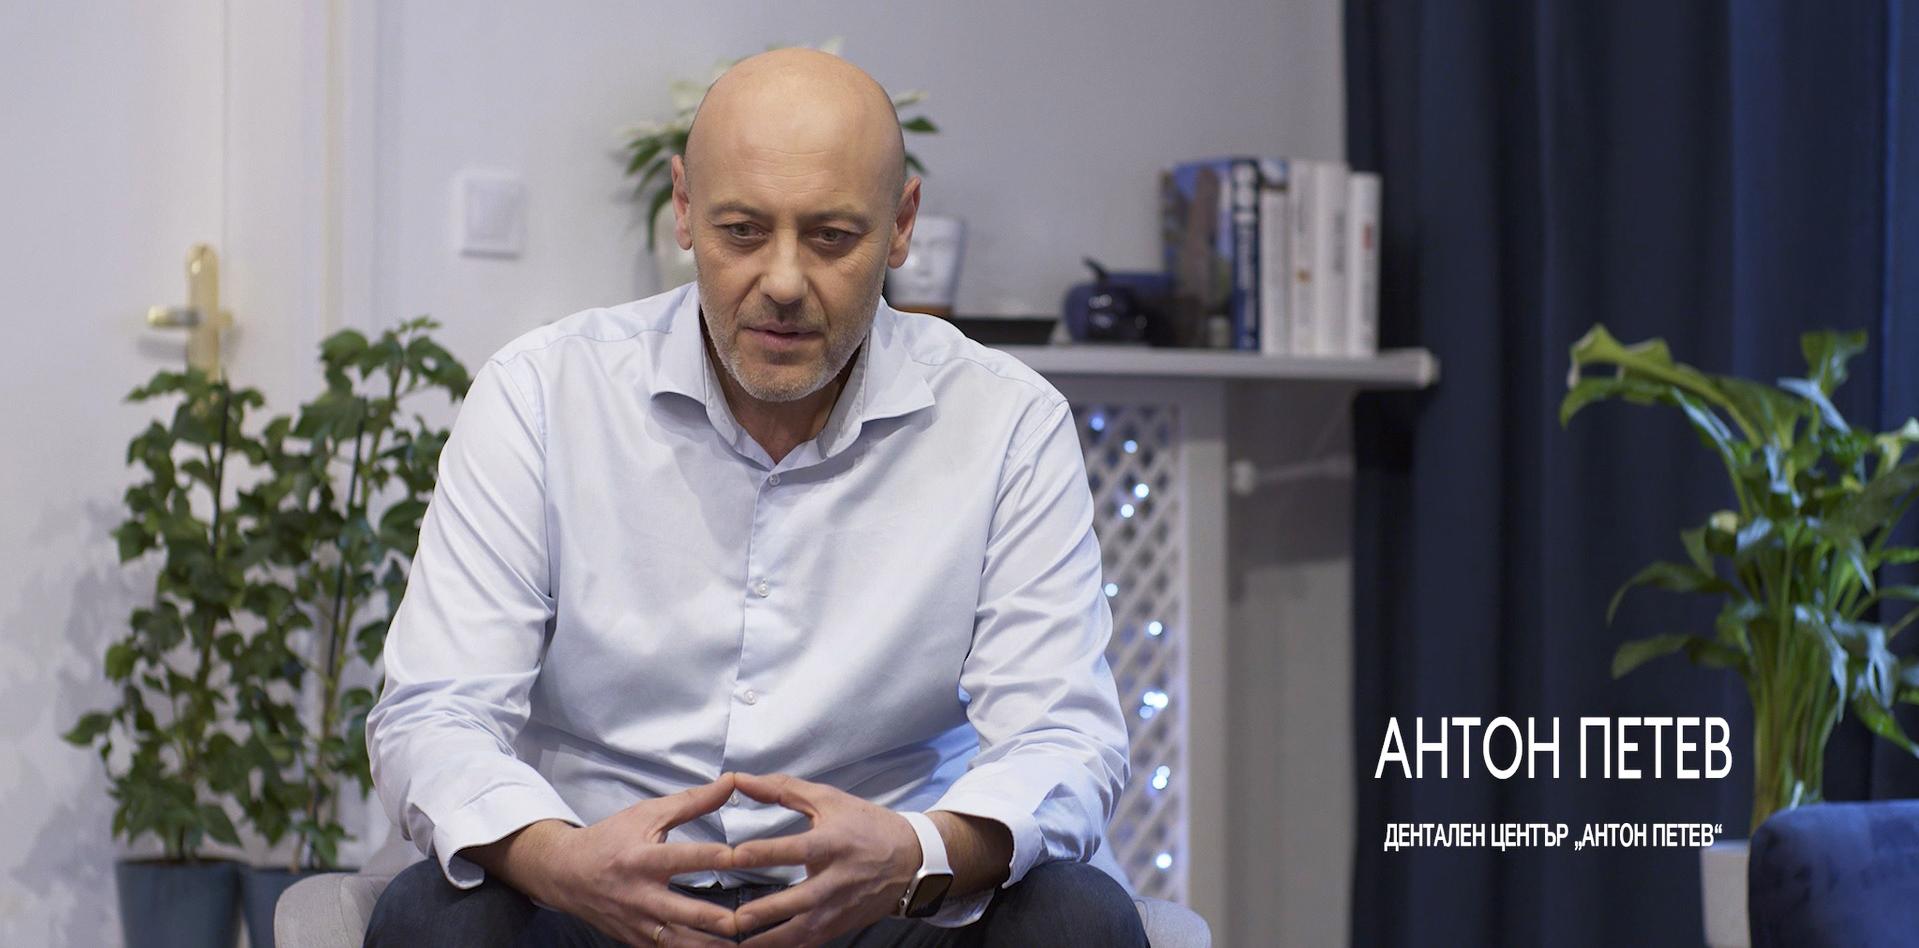 Антон Петев: Новата посока на денталната медицина